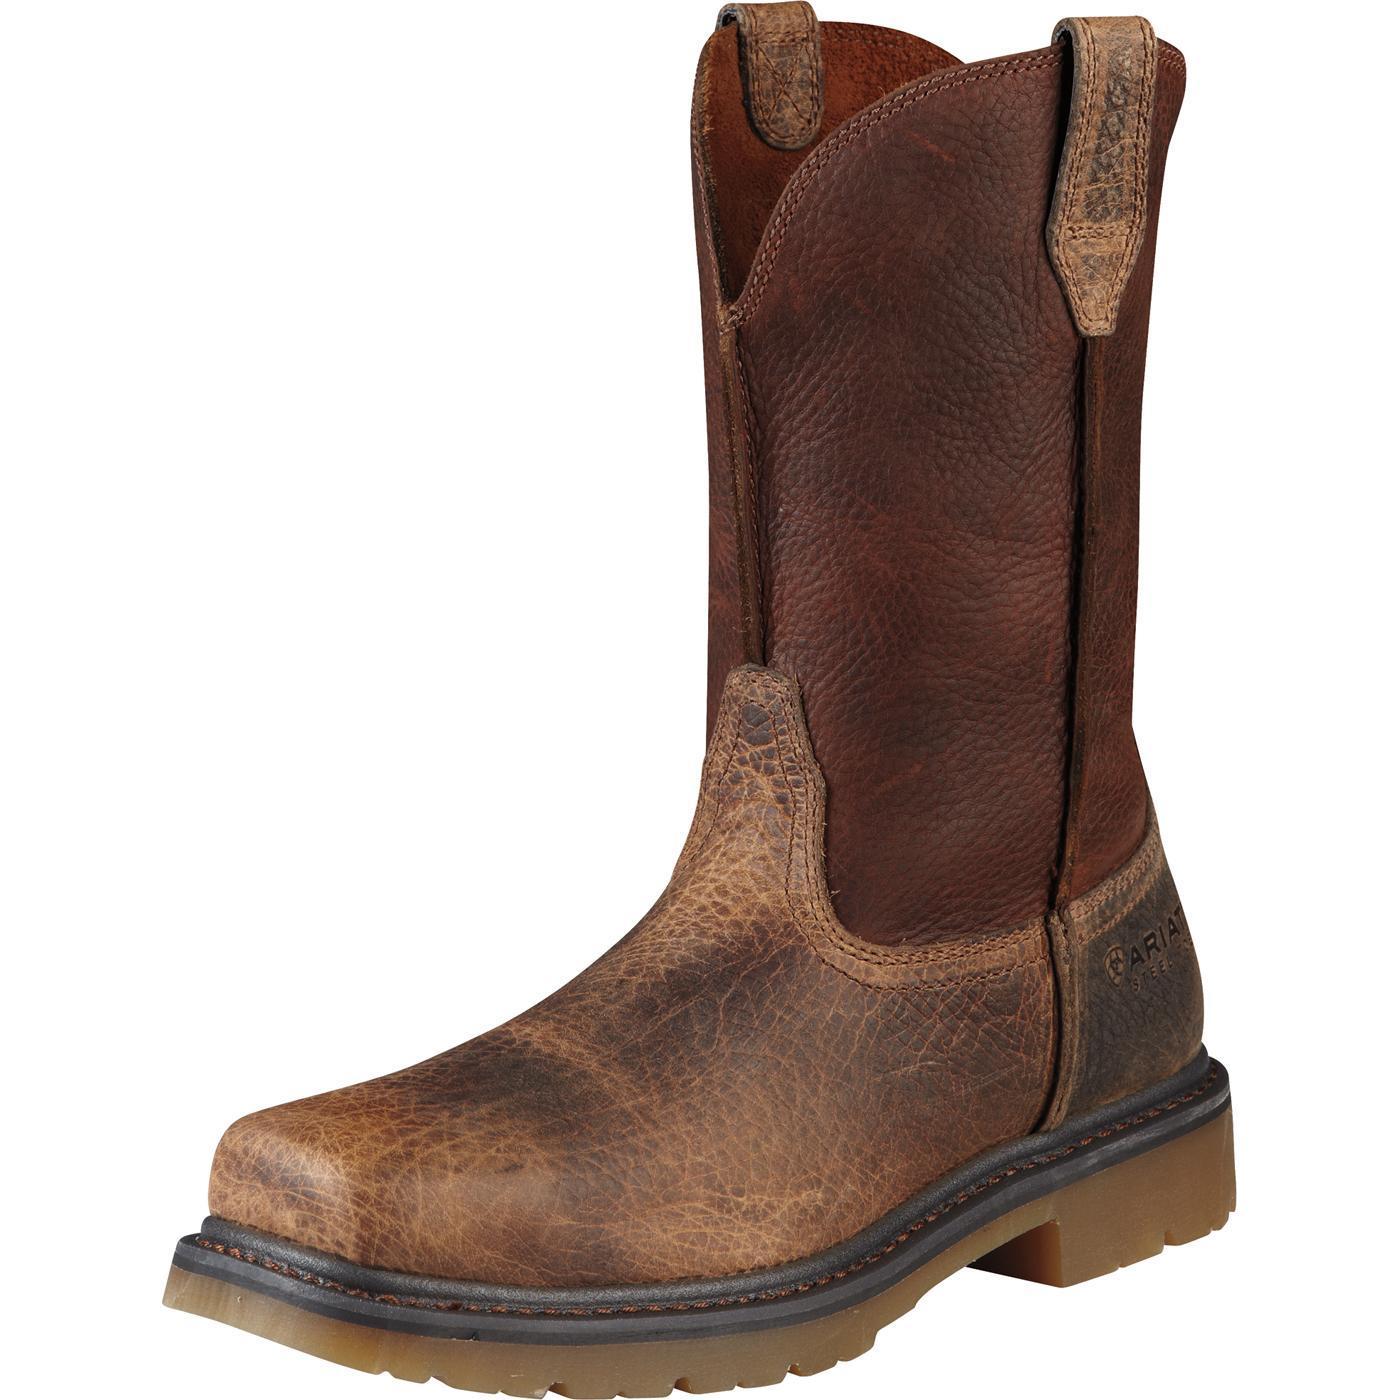 Ariat Rambler Steel Toe Pull On Work Boot 10008642